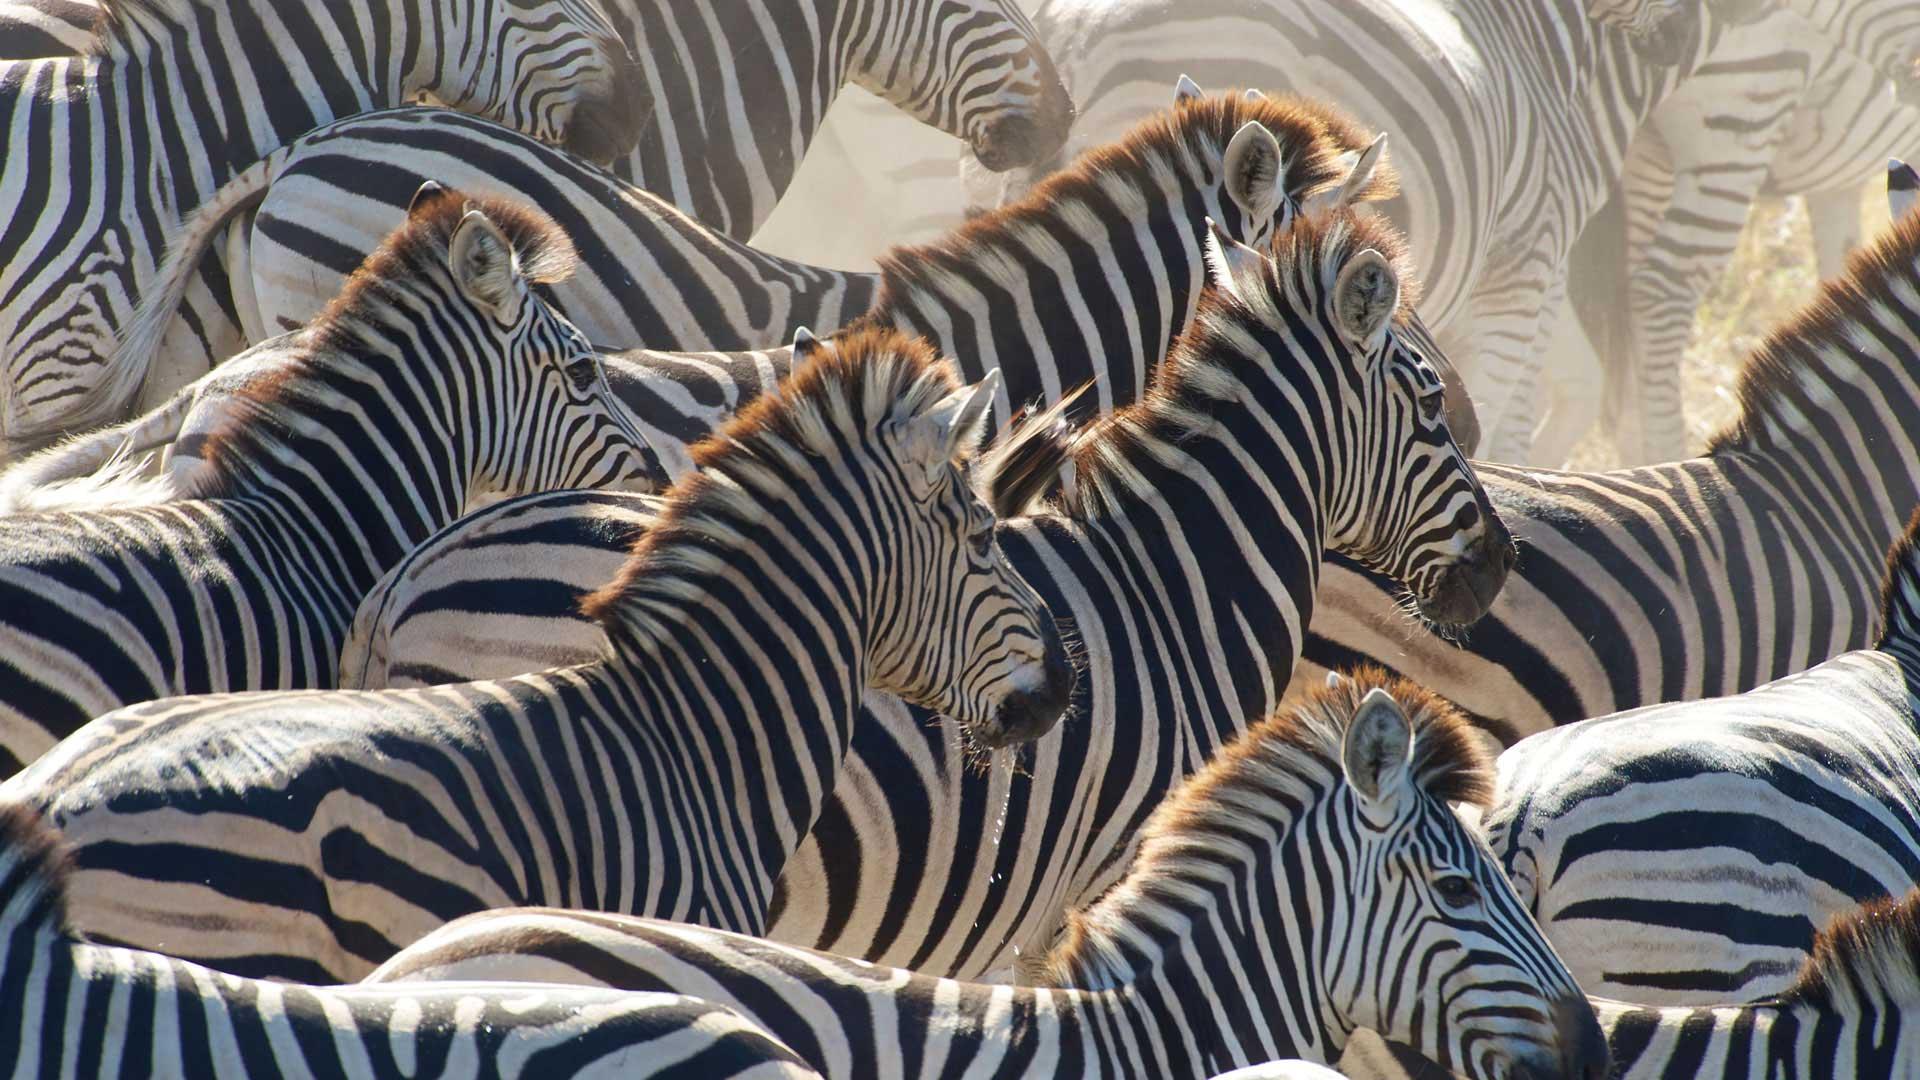 Accompany 20,000 zebras on their annual migration across the Kalahari.